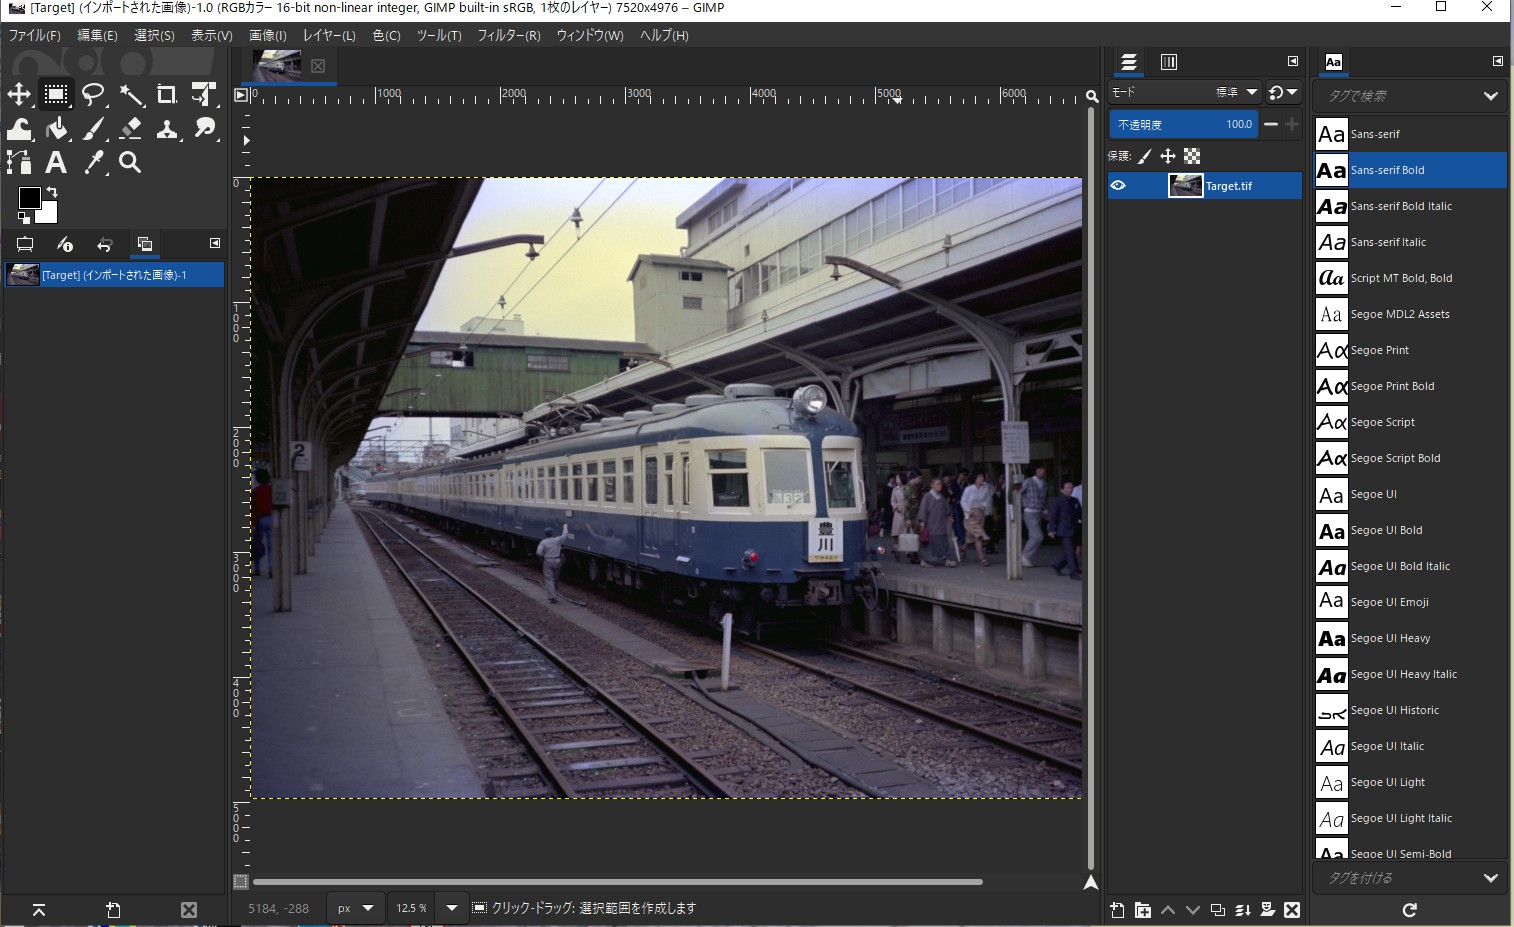 f:id:yasuo_ssi:20210303233243j:plain